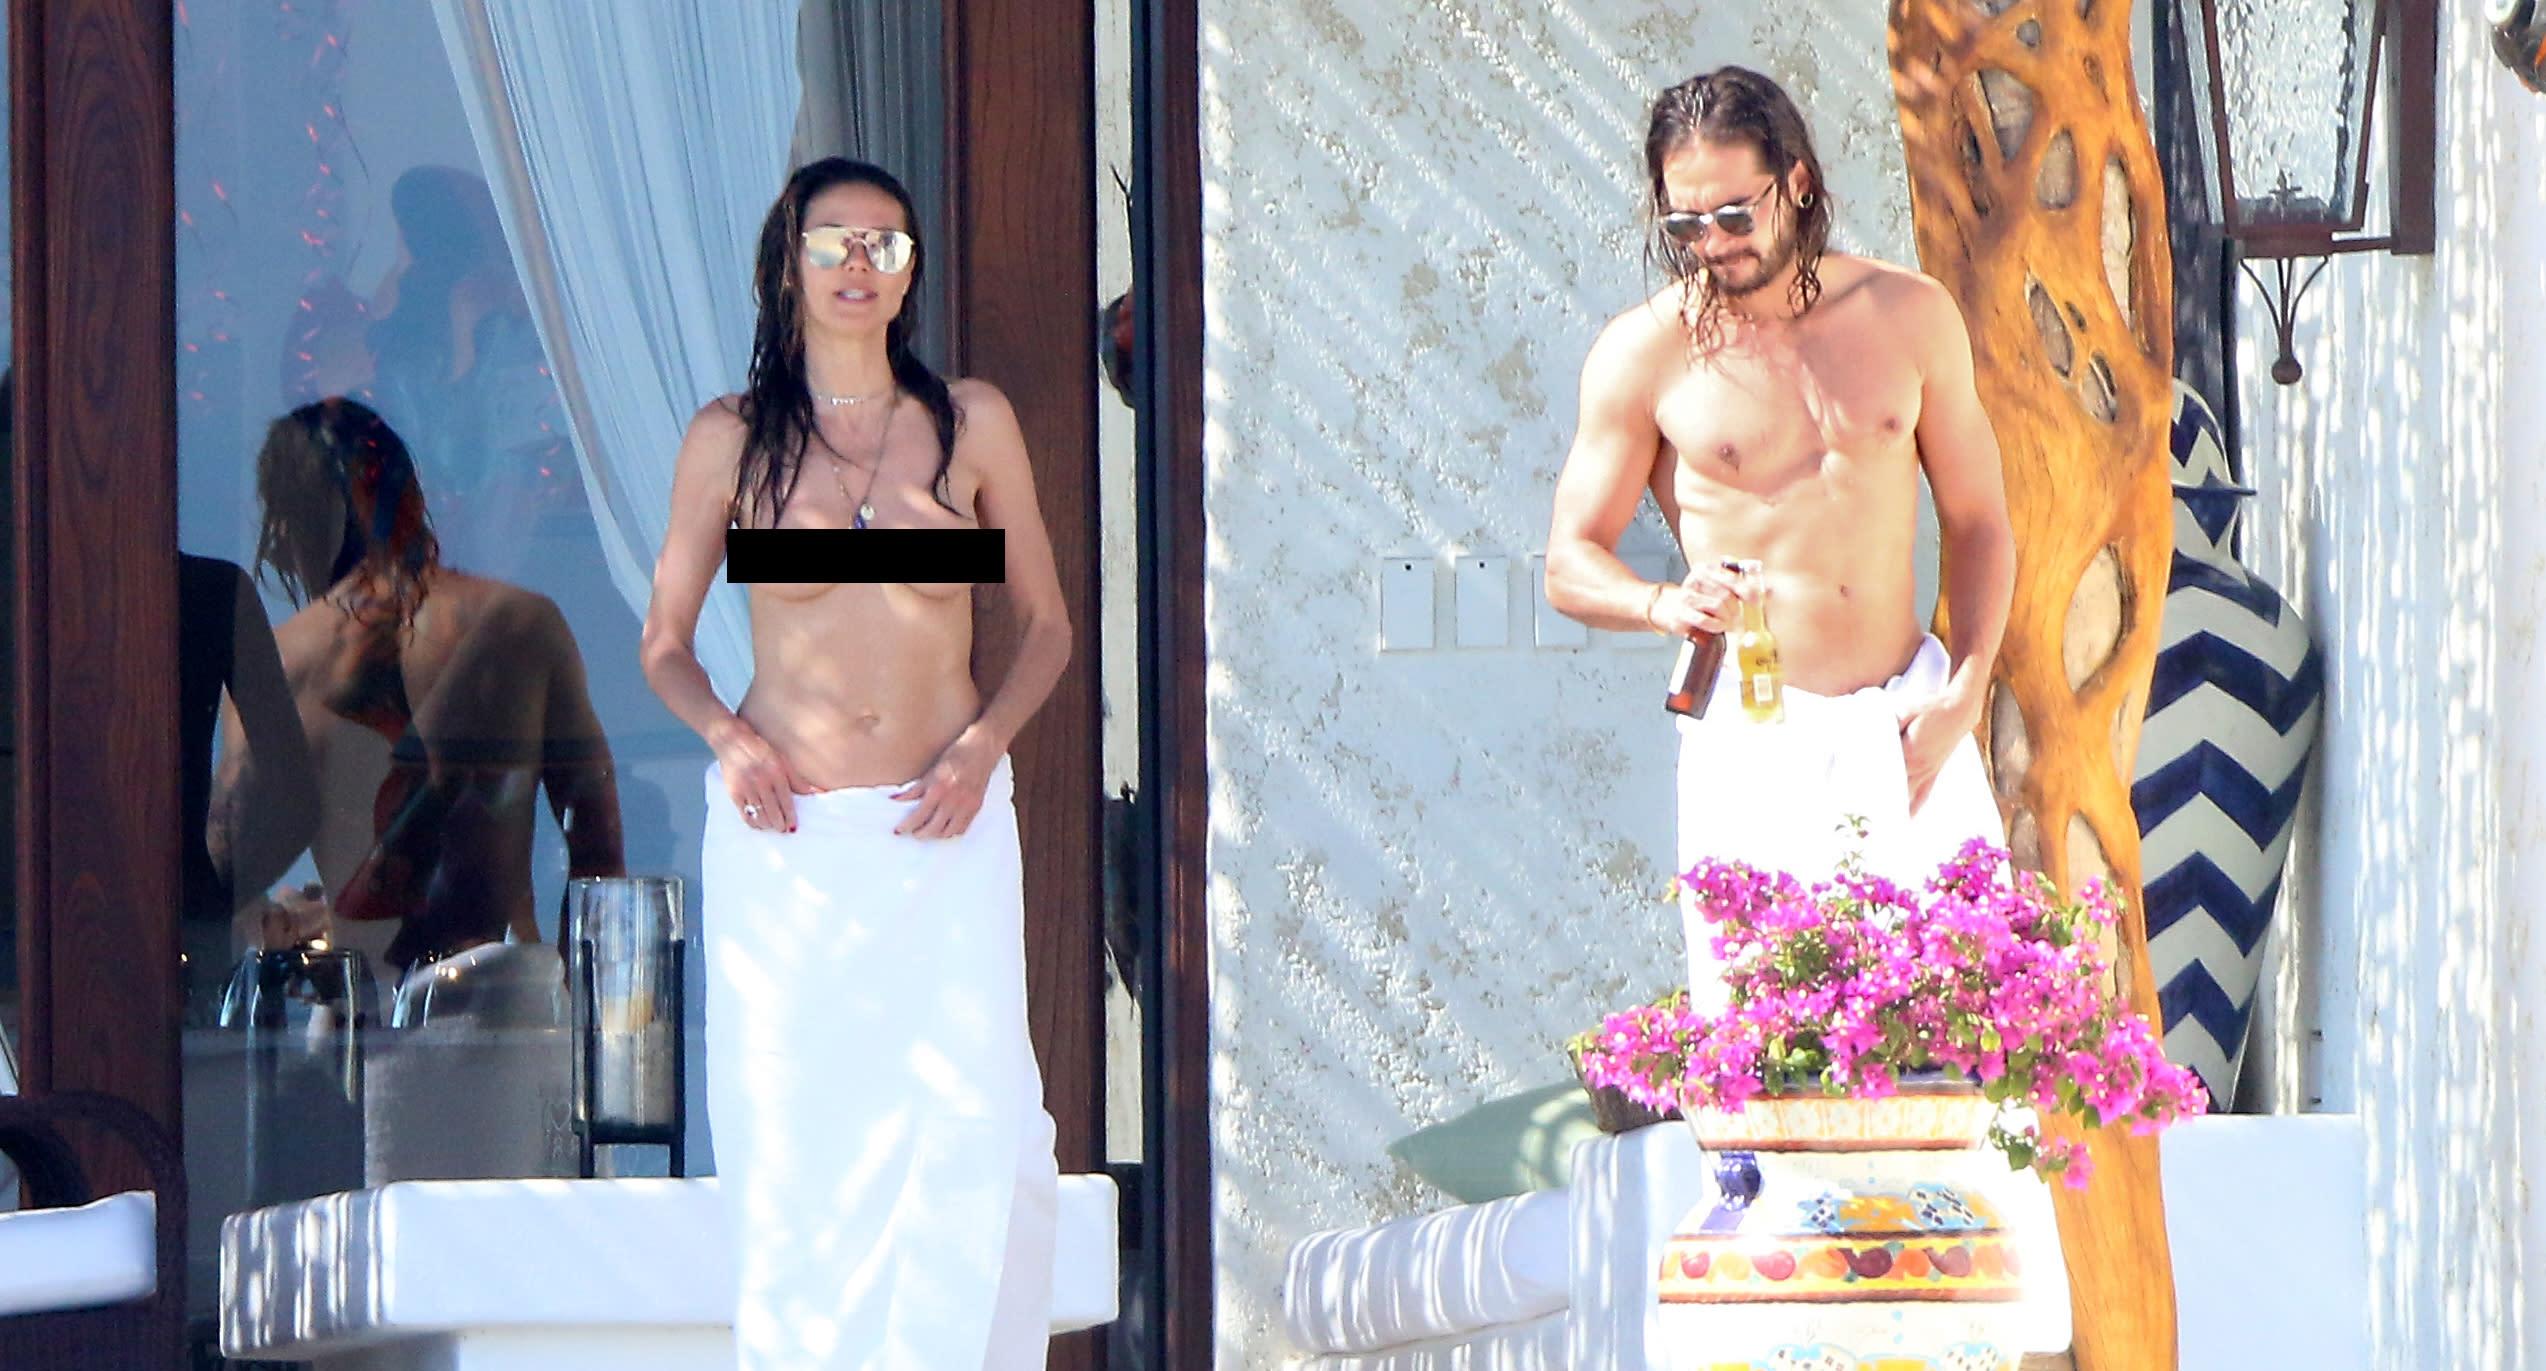 Heidi Klum is enjoying her vacation with new boyfriend Tom Kaulitz. (Photo: Splash News)